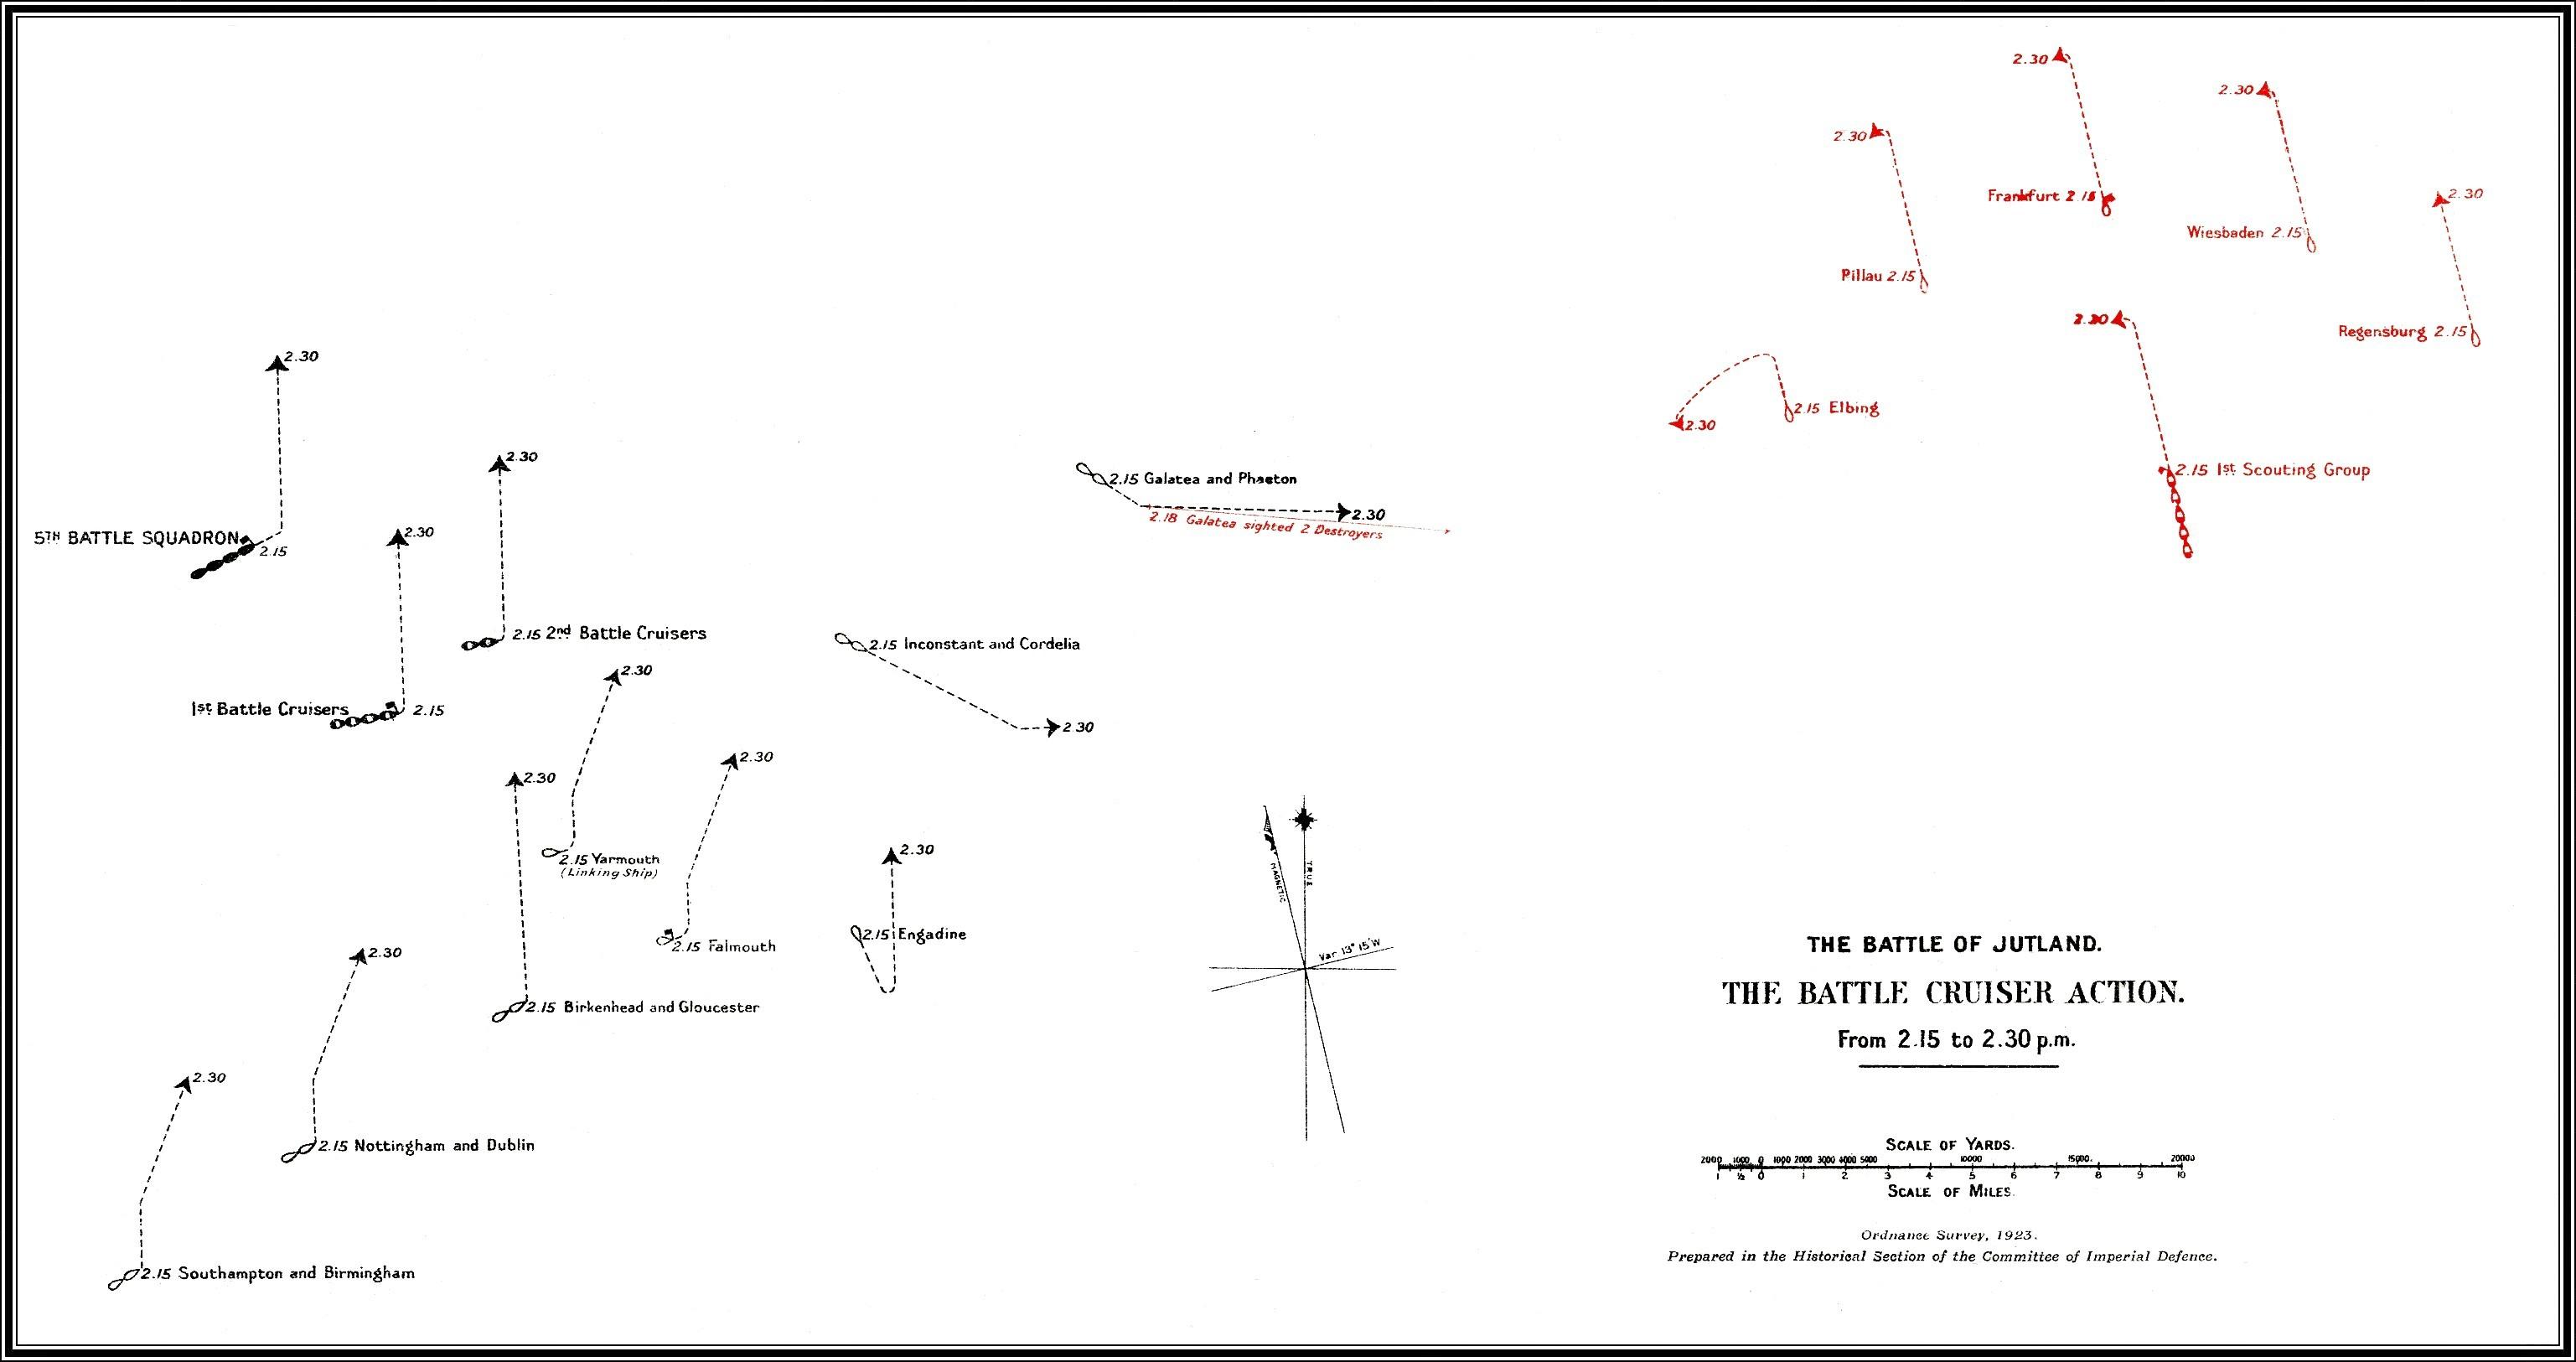 Royal Navy Naval Operations Volume 3 By Sir Julian Corbett Kite Diagrams Youtube Online History Of World War 1